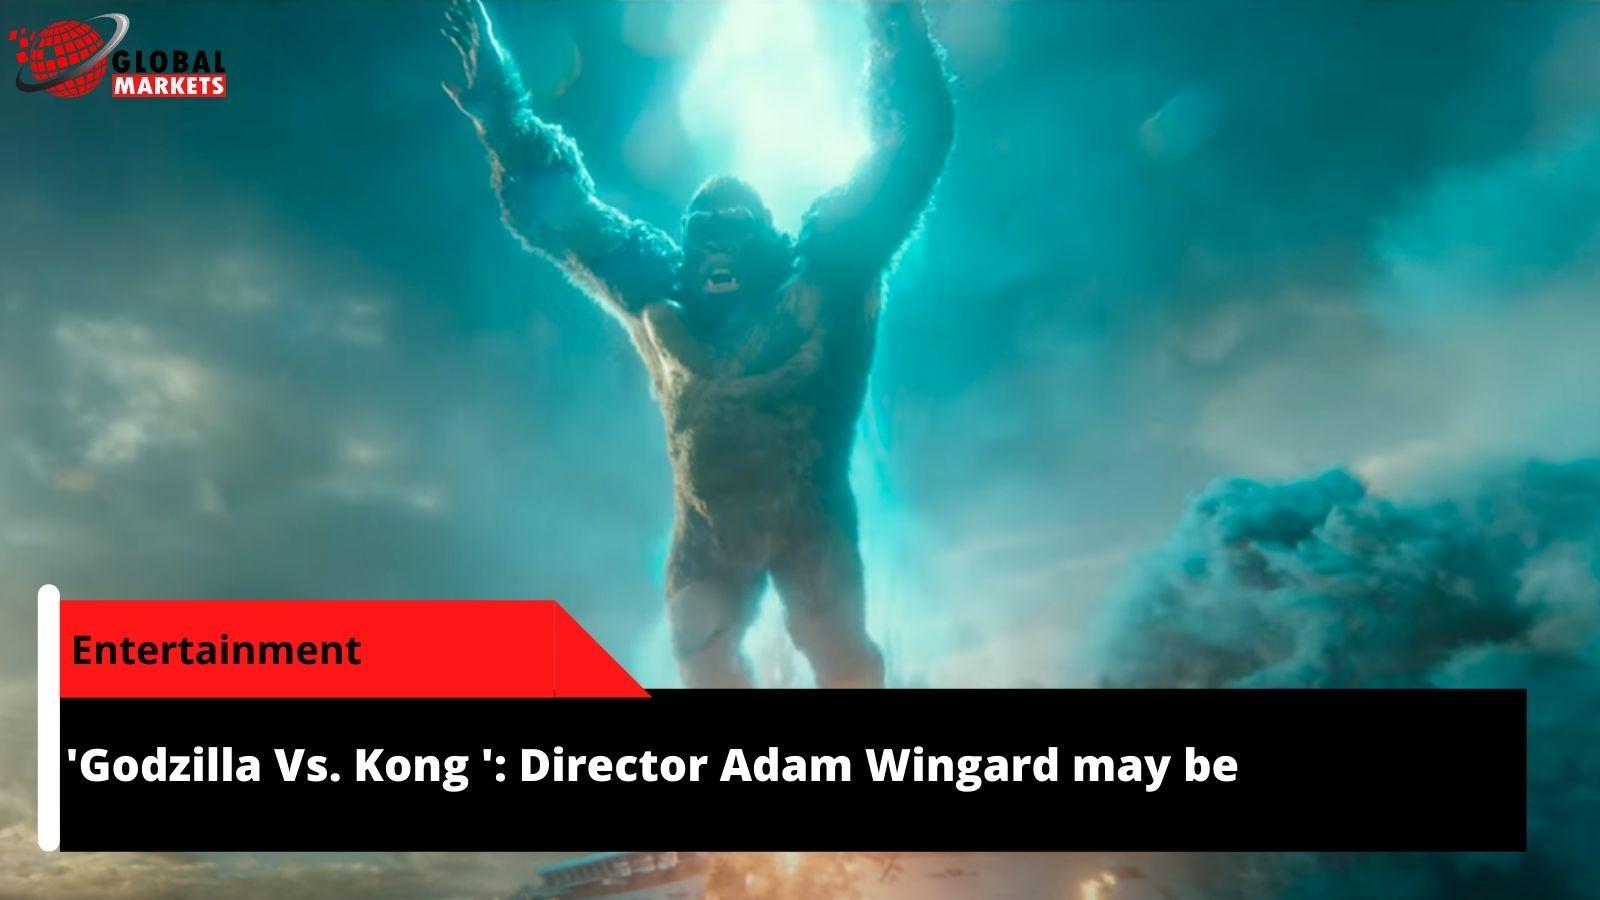 'Godzilla Vs. Kong ': Director Adam Wingard may be